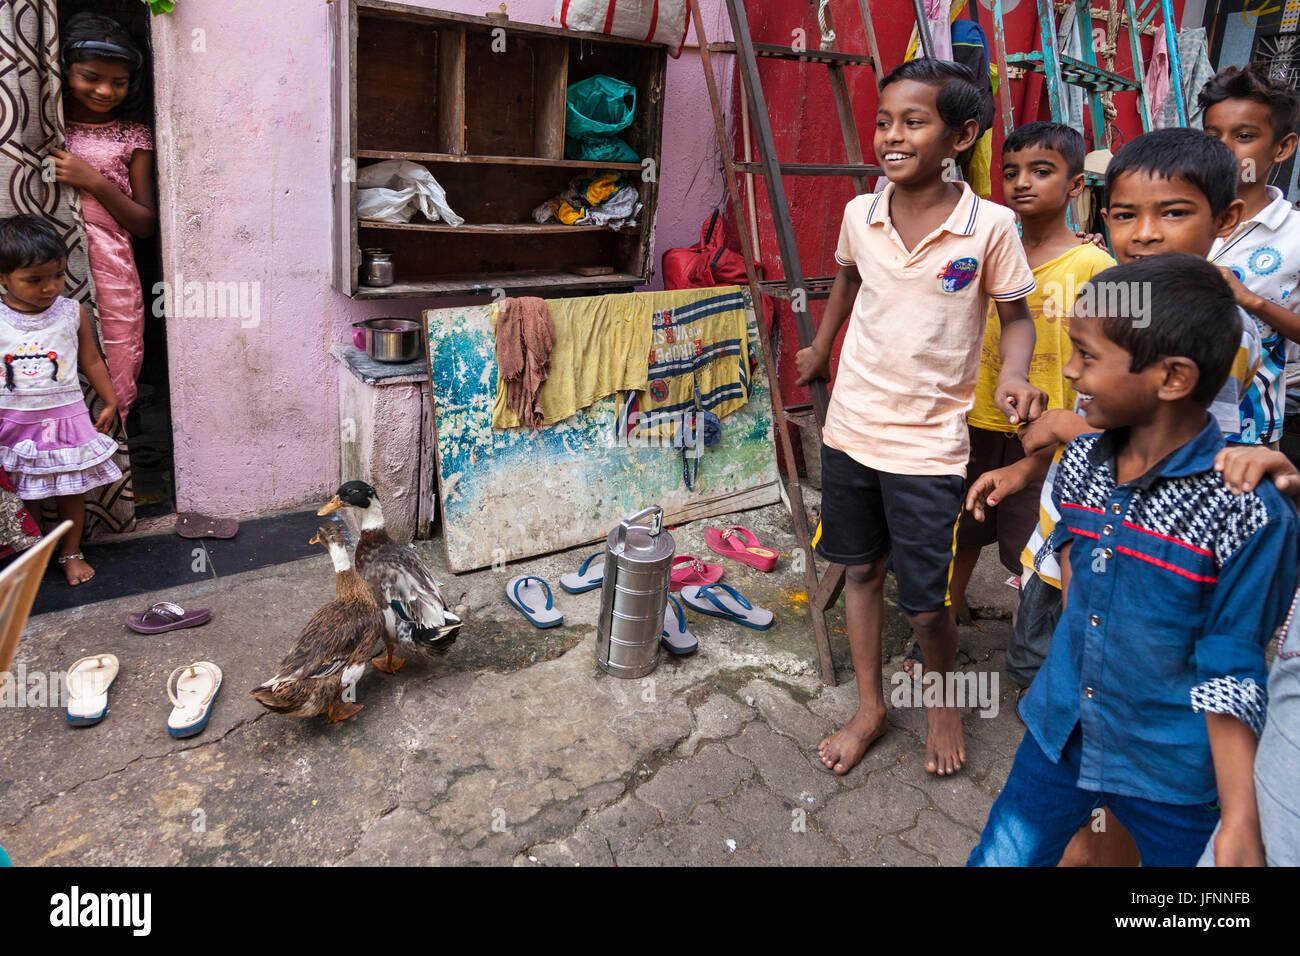 Children in south Mumbai, India - Stock Image